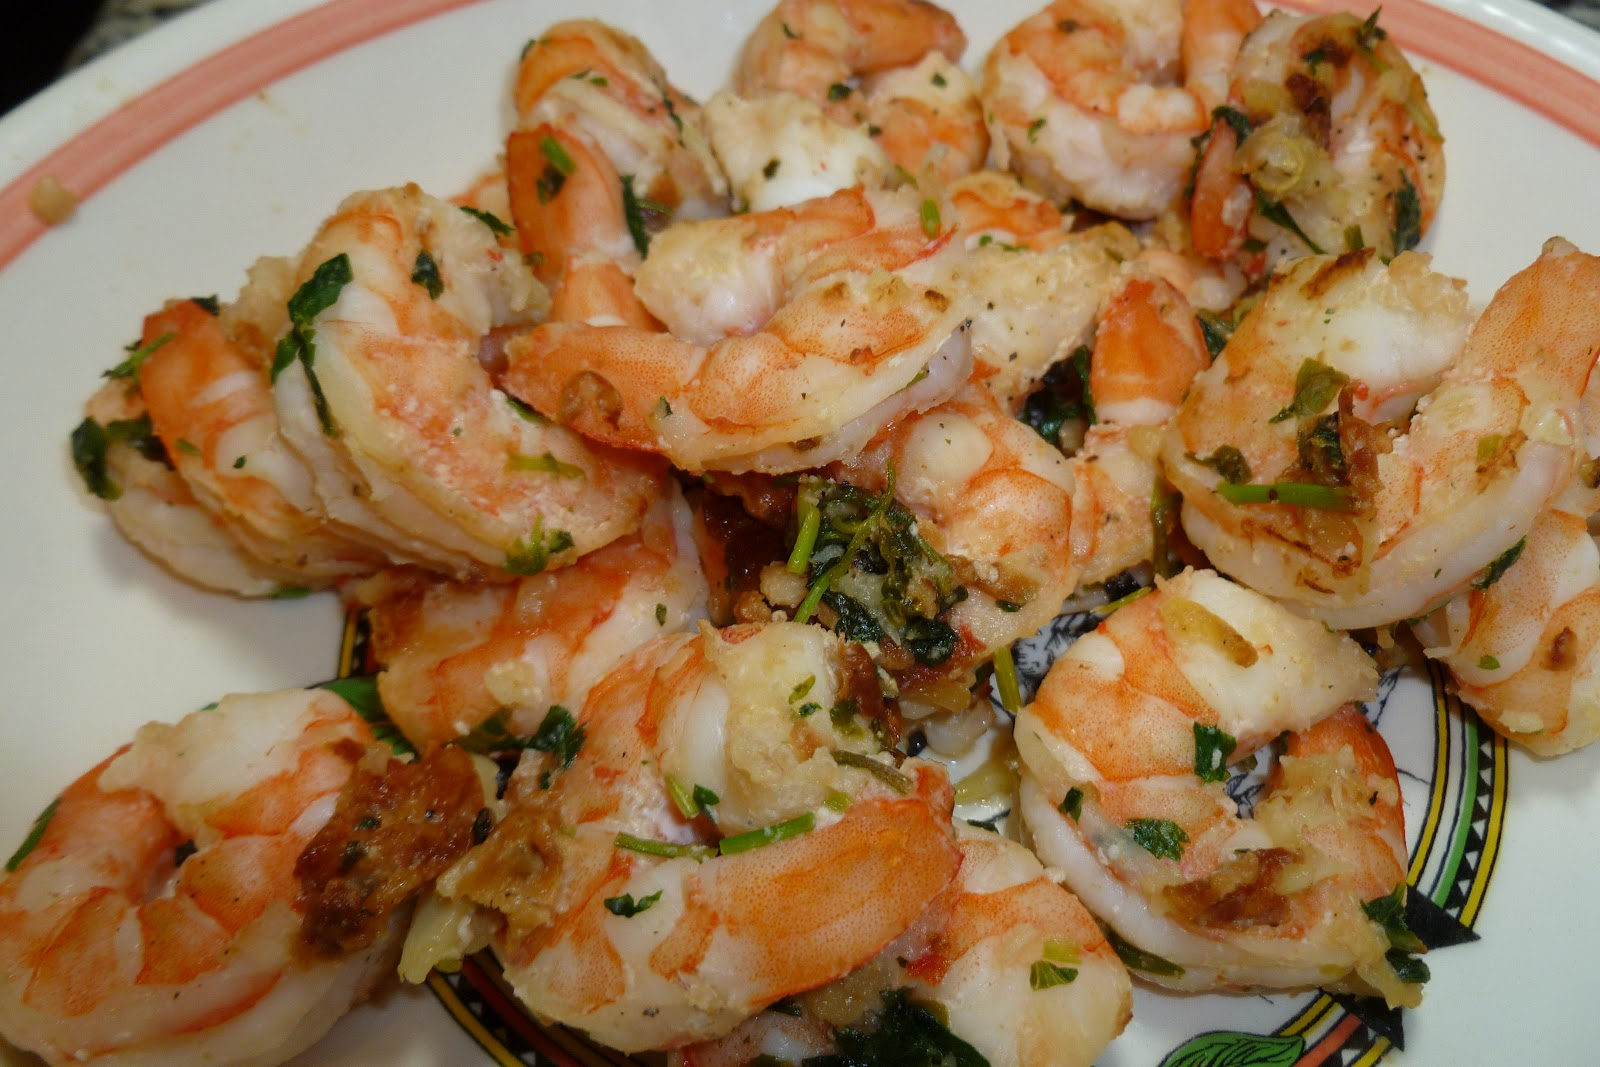 Cilantro Lime Shrimp - made October 17, 2012 from Skinny Taste